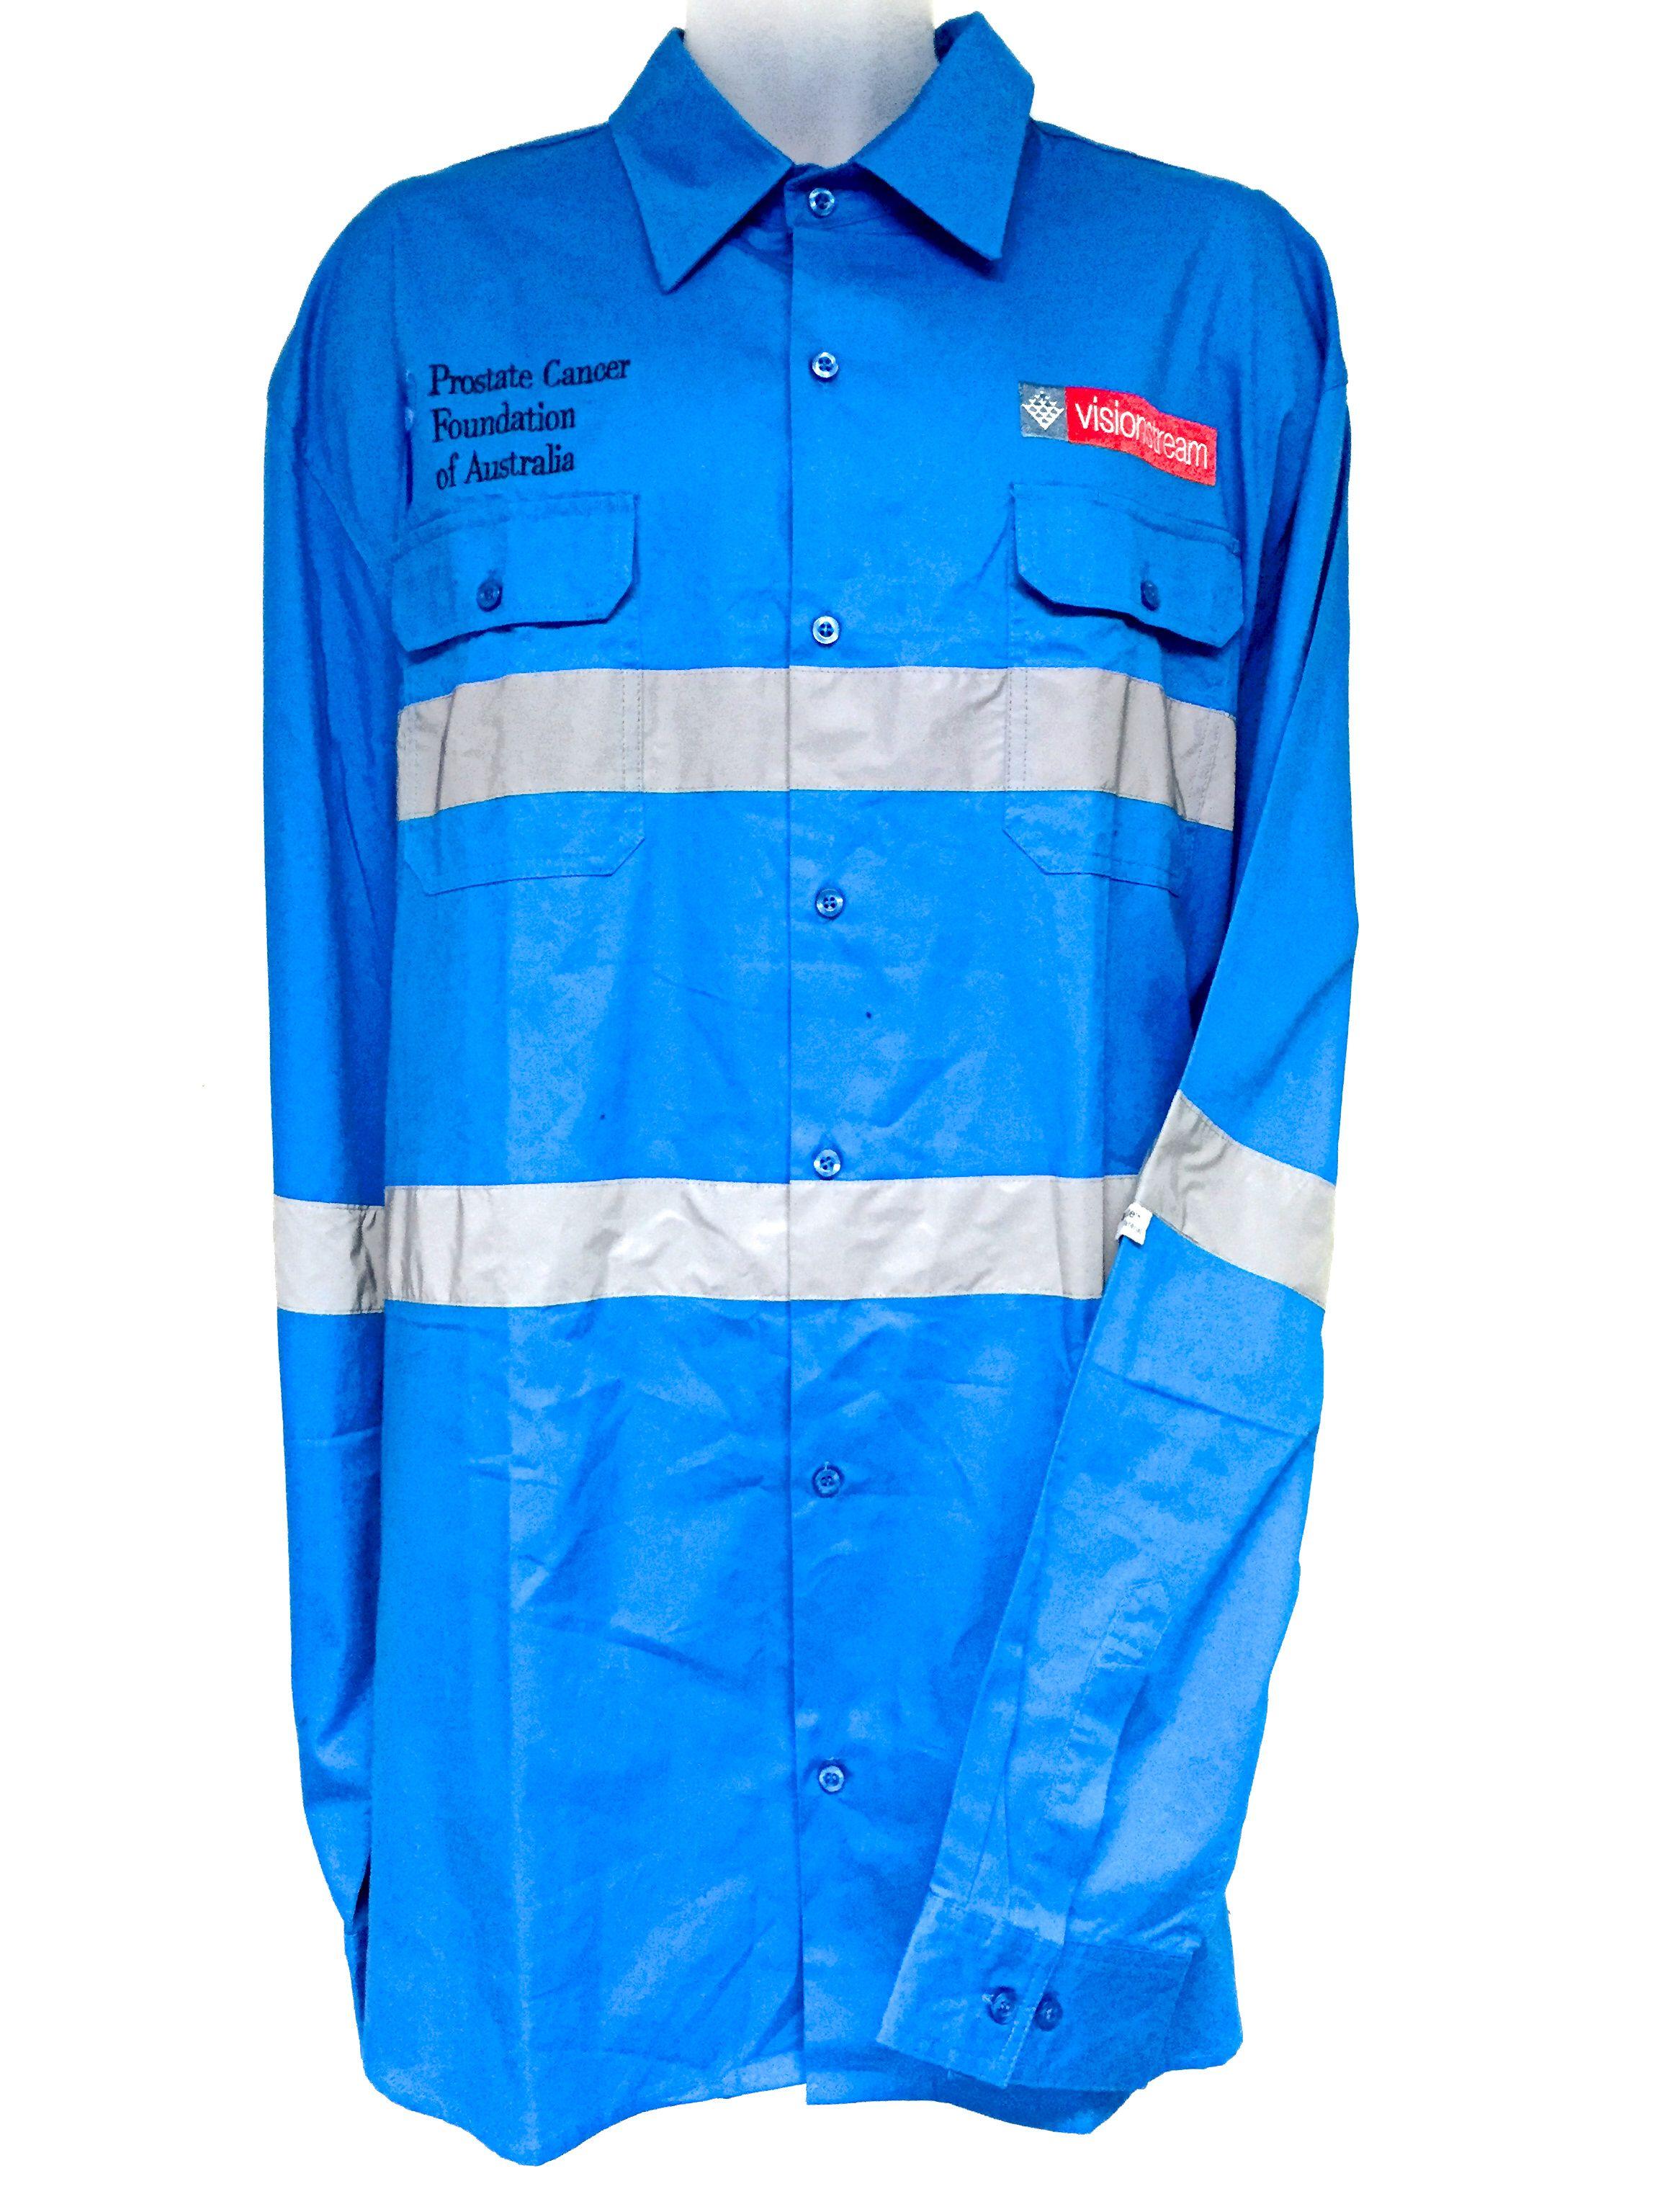 Cyan Blue Workwear Work Shirts Prostate Cancer Design Your Own Custom